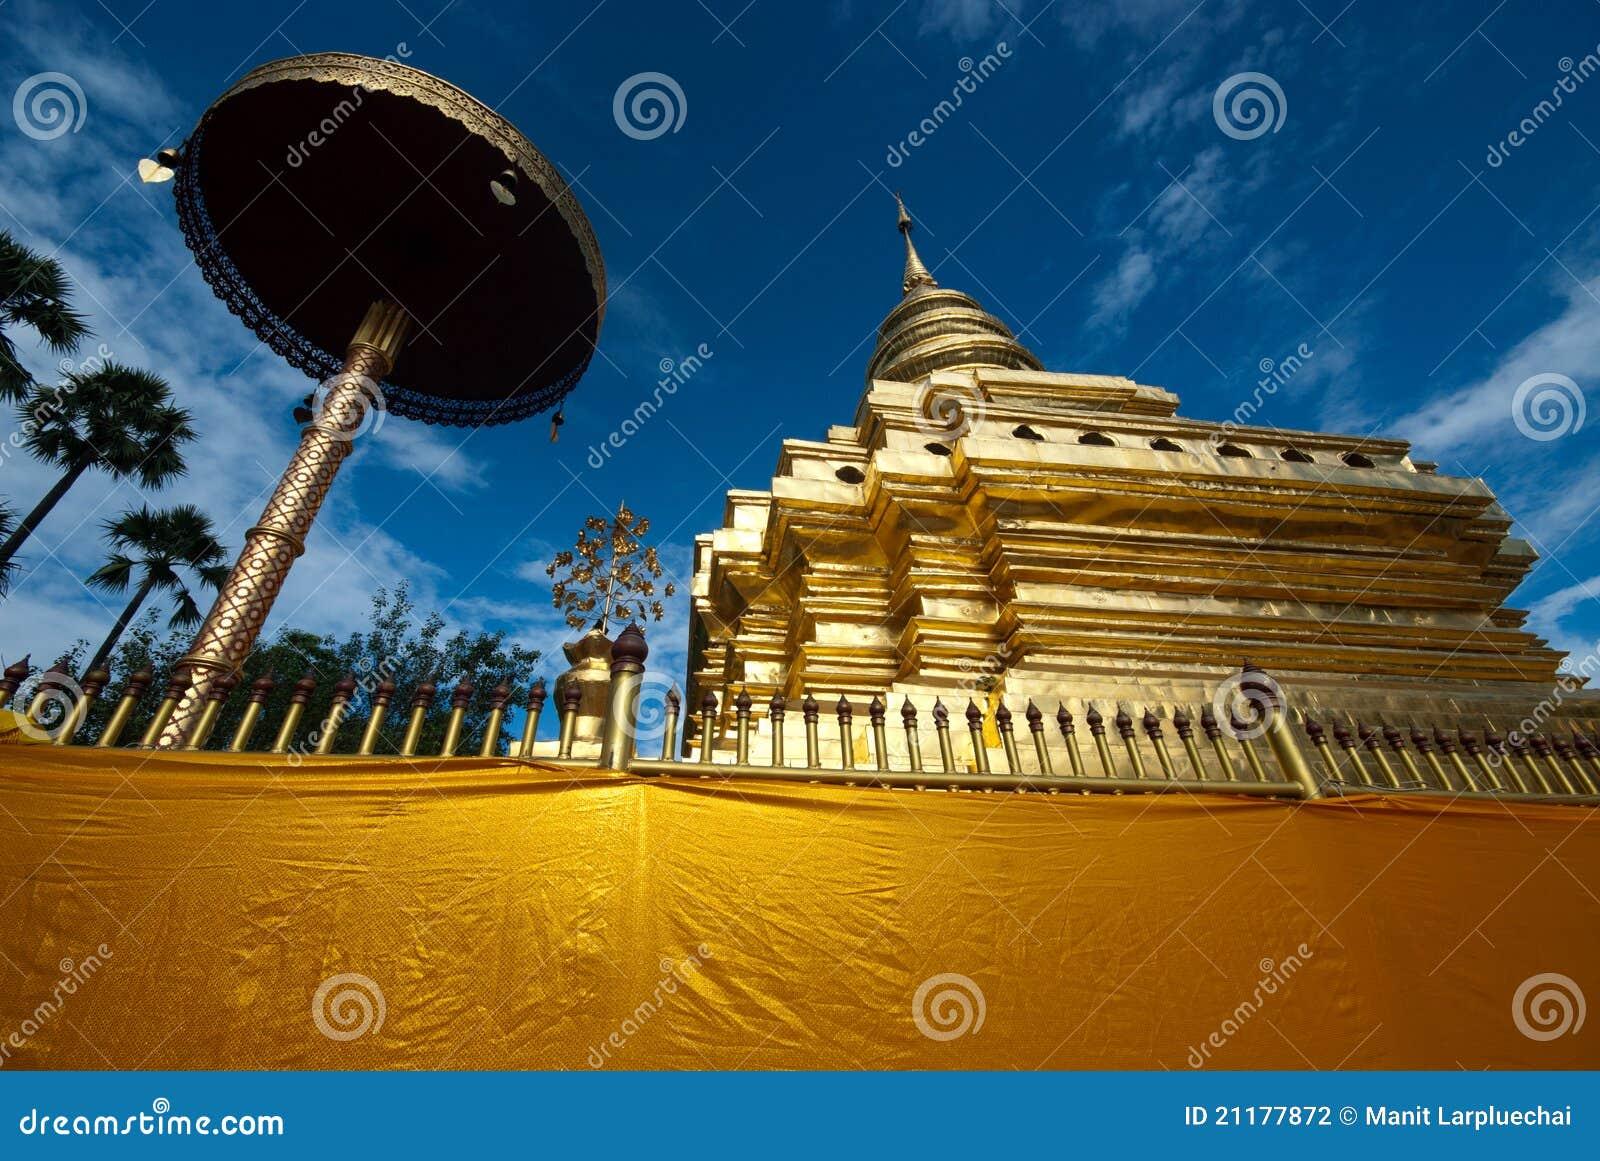 Golden ancient pagoda in Thailand .